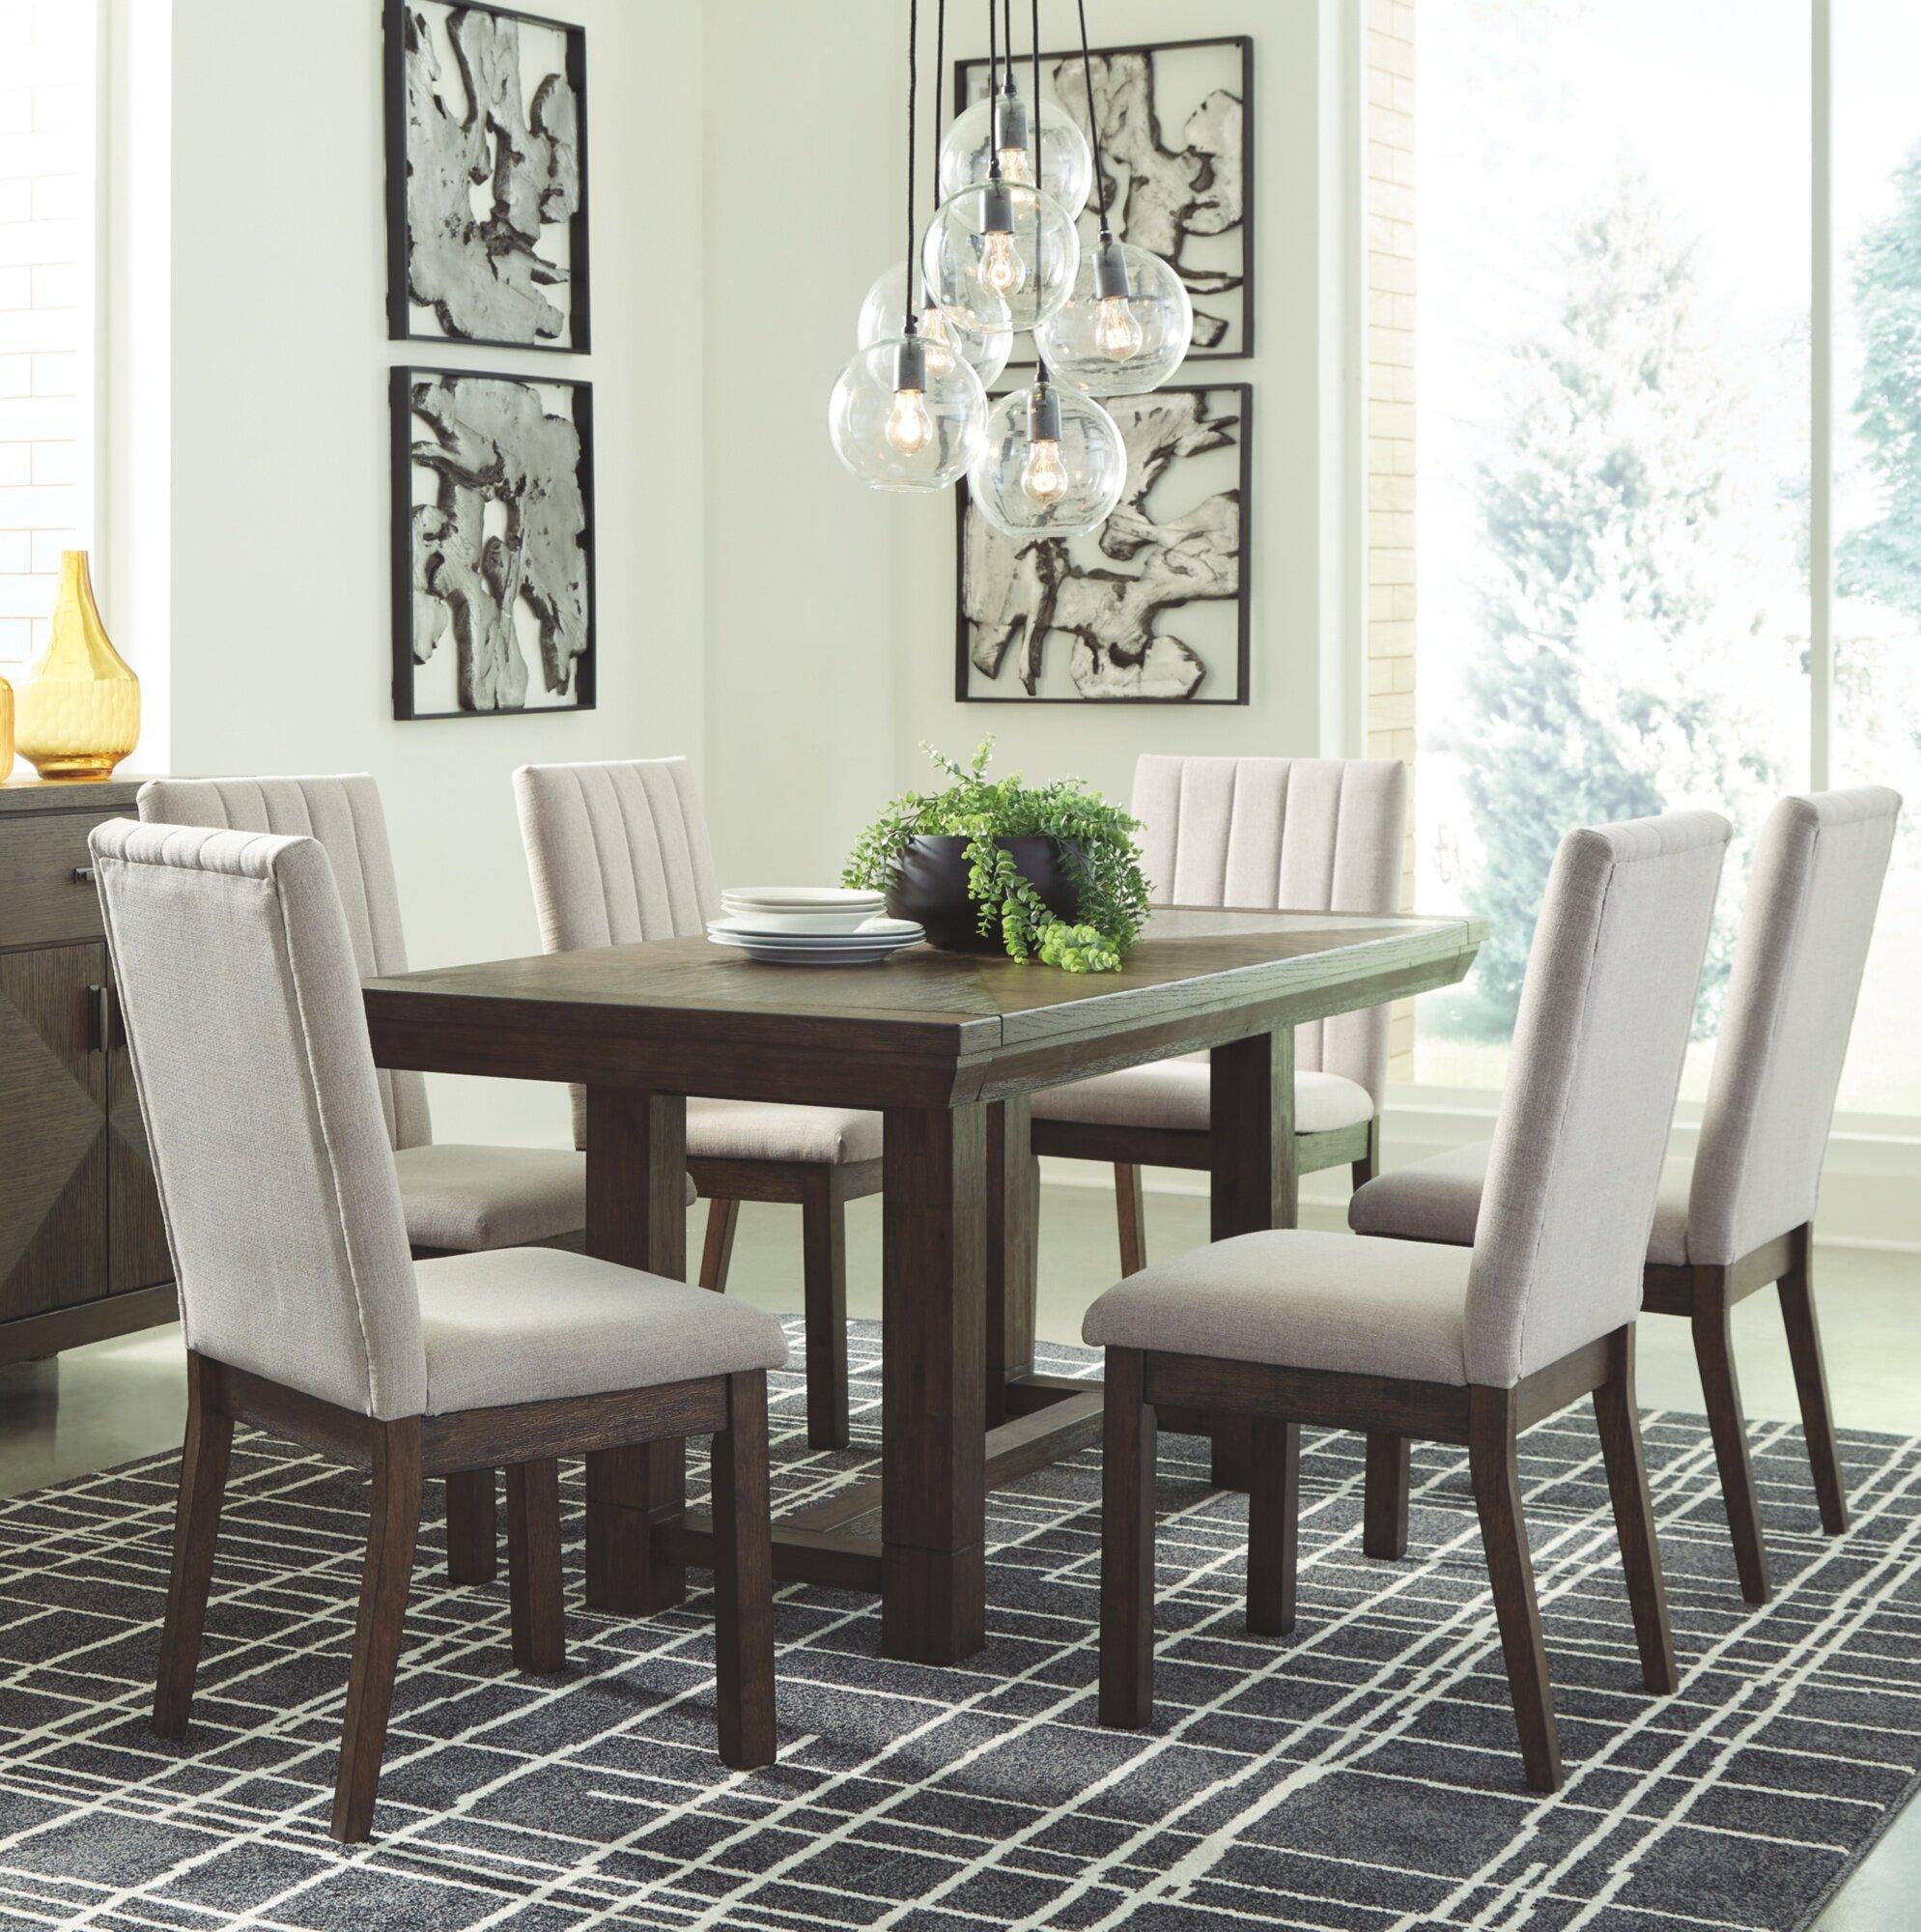 Vergas 7 Piece Dining Set Reviews